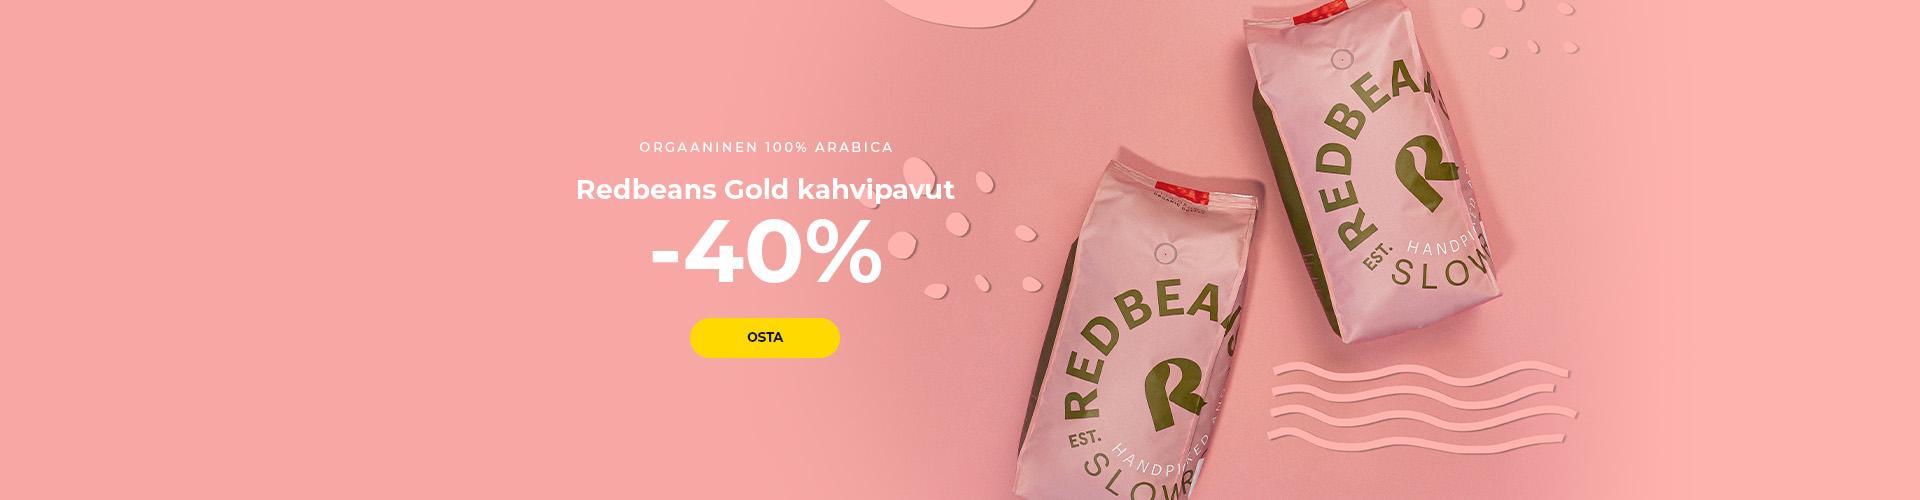 Redbeans Gold kahvipavut -40%